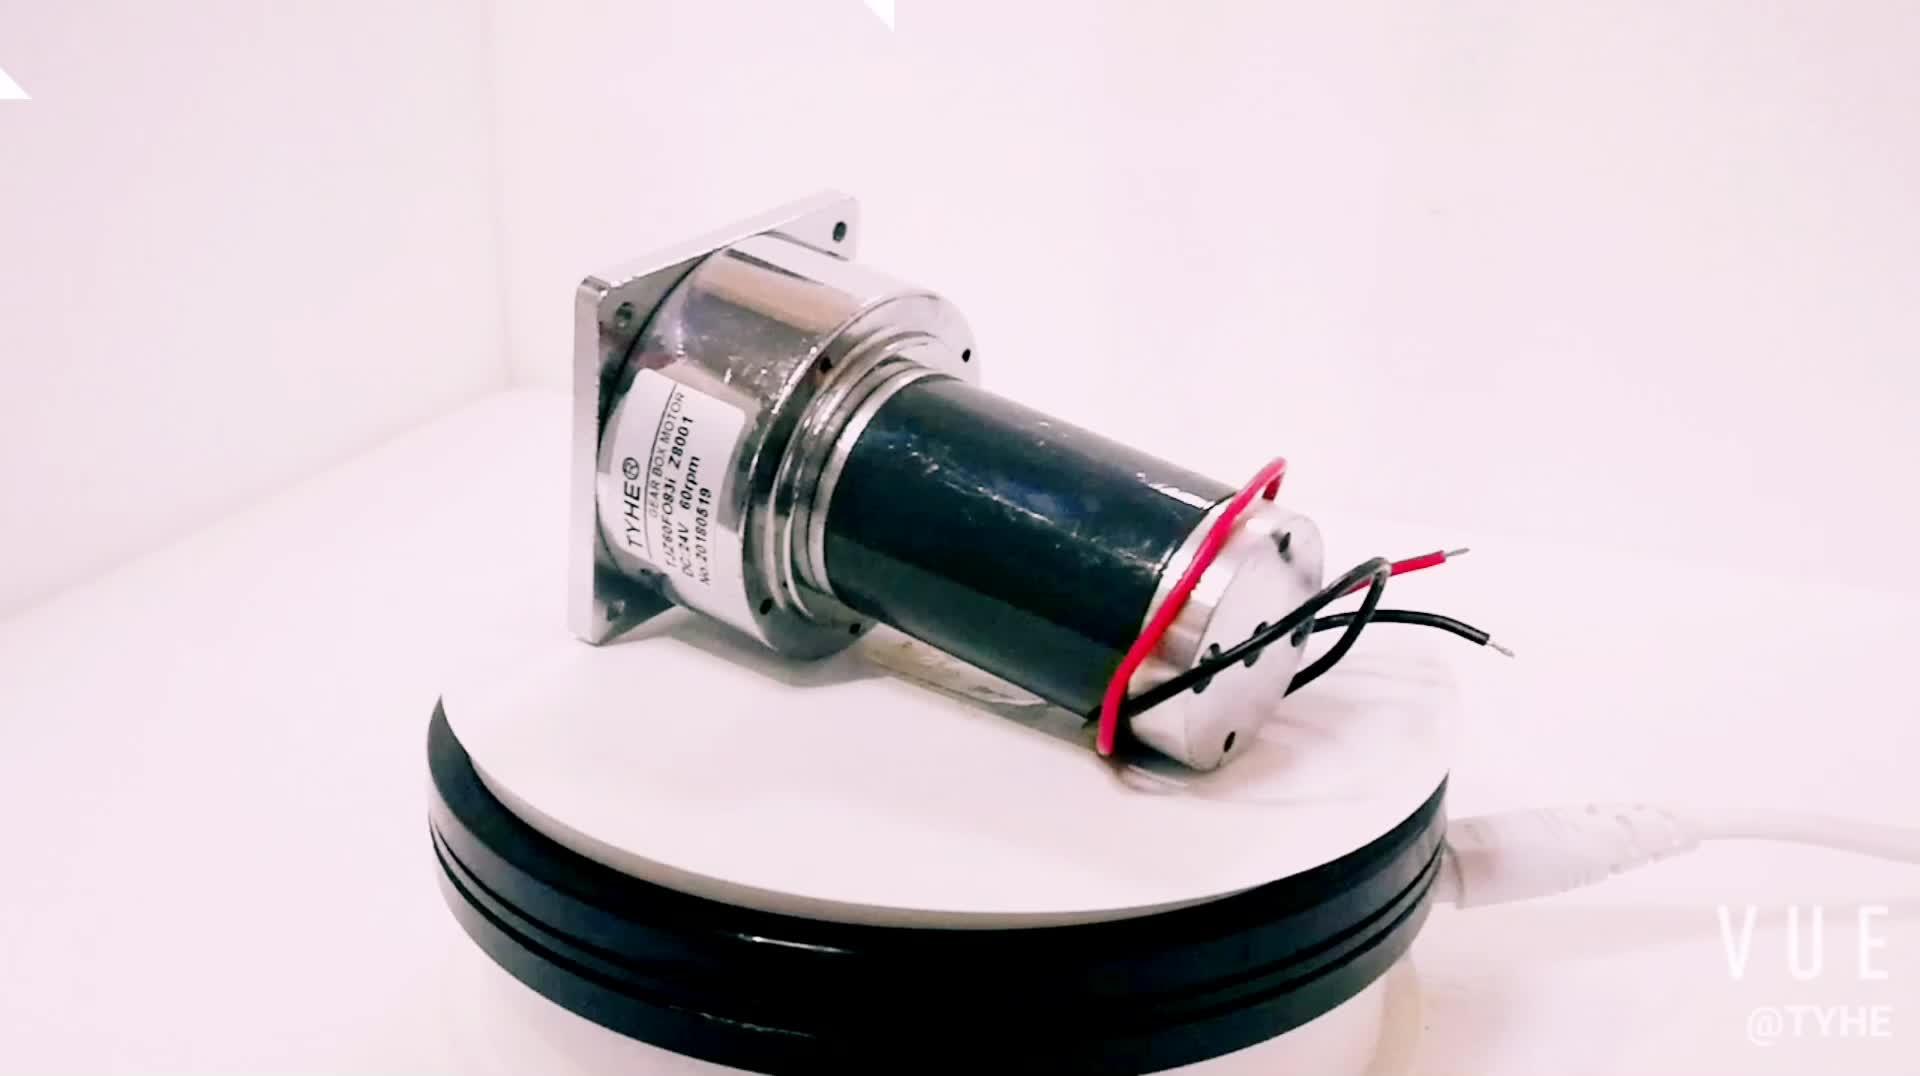 REVERSIBLE 60 มม.เส้นผ่าศูนย์กลาง 12 V 18 V 24 V 30 วัตต์แปรง DC มอเตอร์เกียร์โลหะสำหรับเจาะส่งออกในเซินเจิ้น